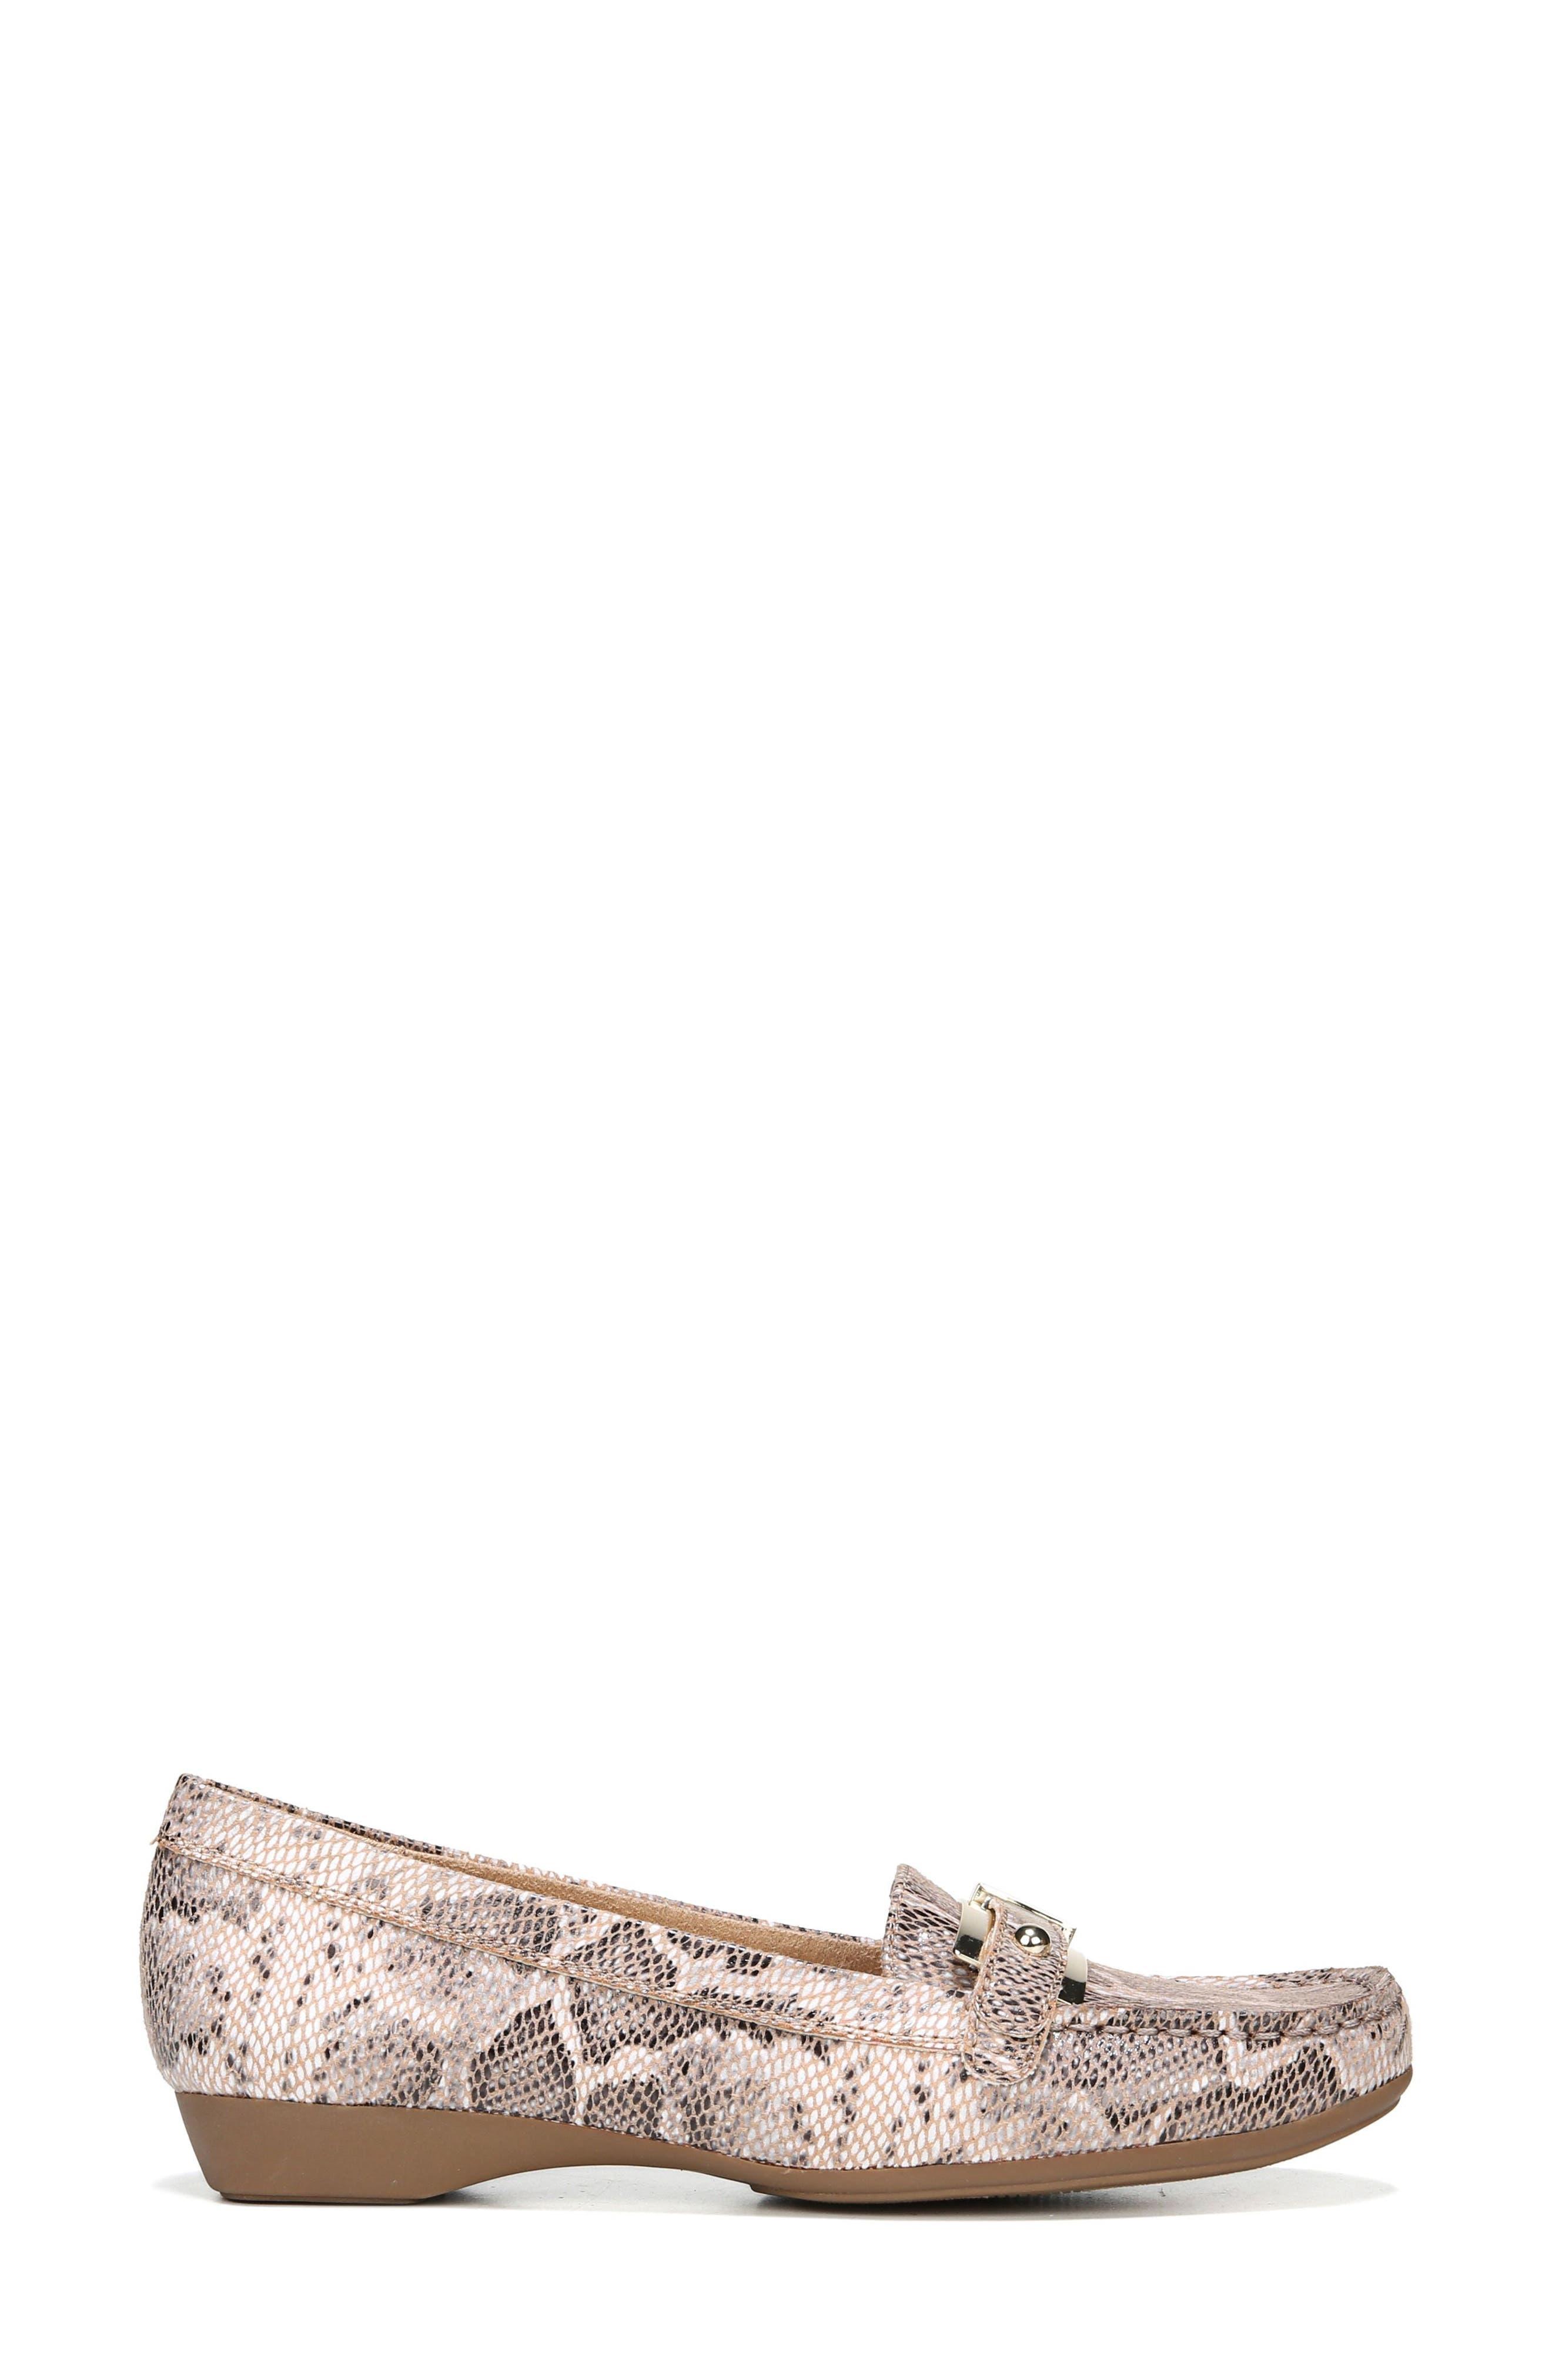 'Gisella' Loafer,                             Alternate thumbnail 3, color,                             Mauve Print Fabric